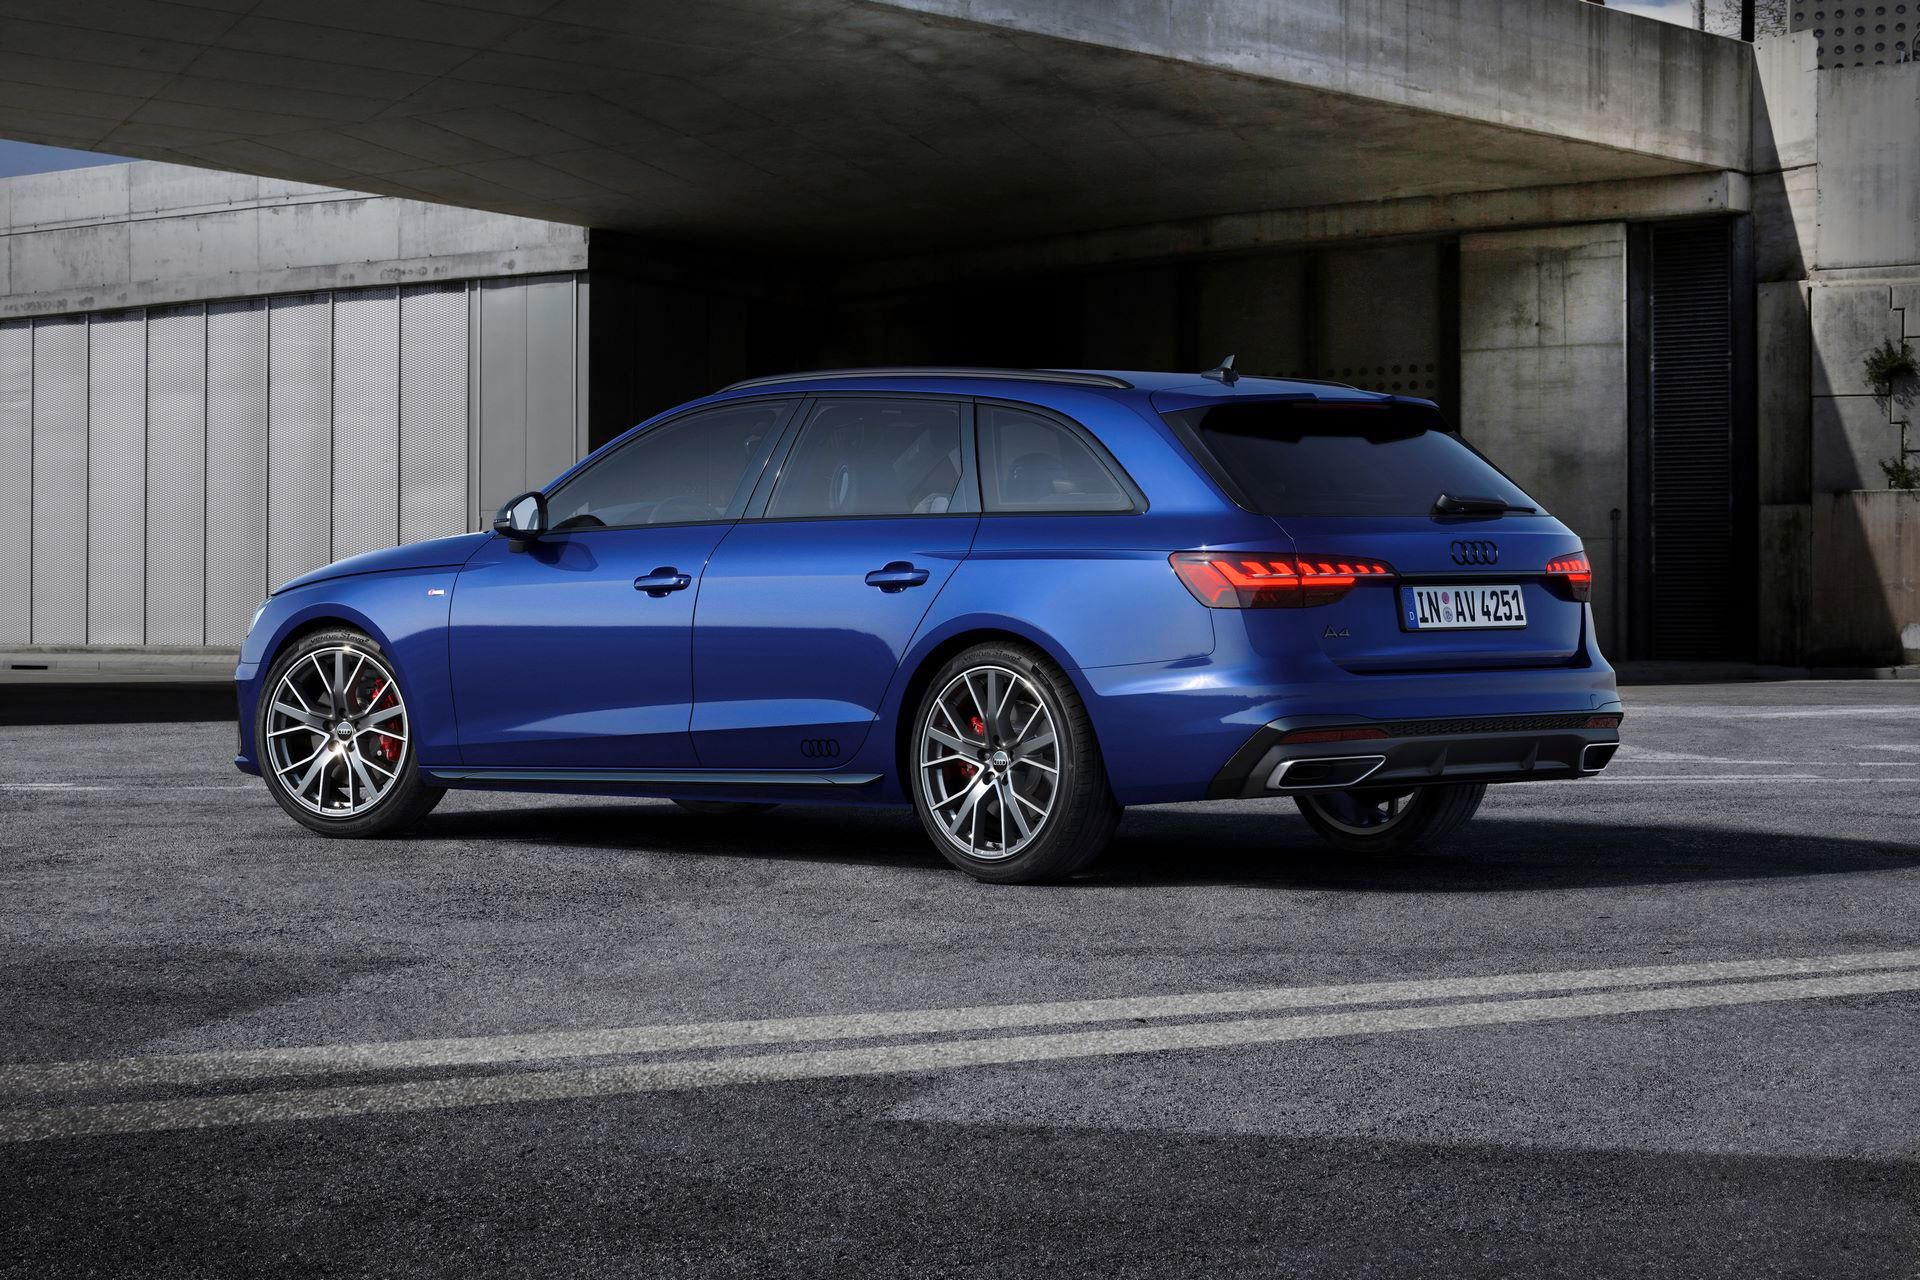 Audi-A4-A5-Q7-Q8-Competition-And-Competition-Plus-Trims-54